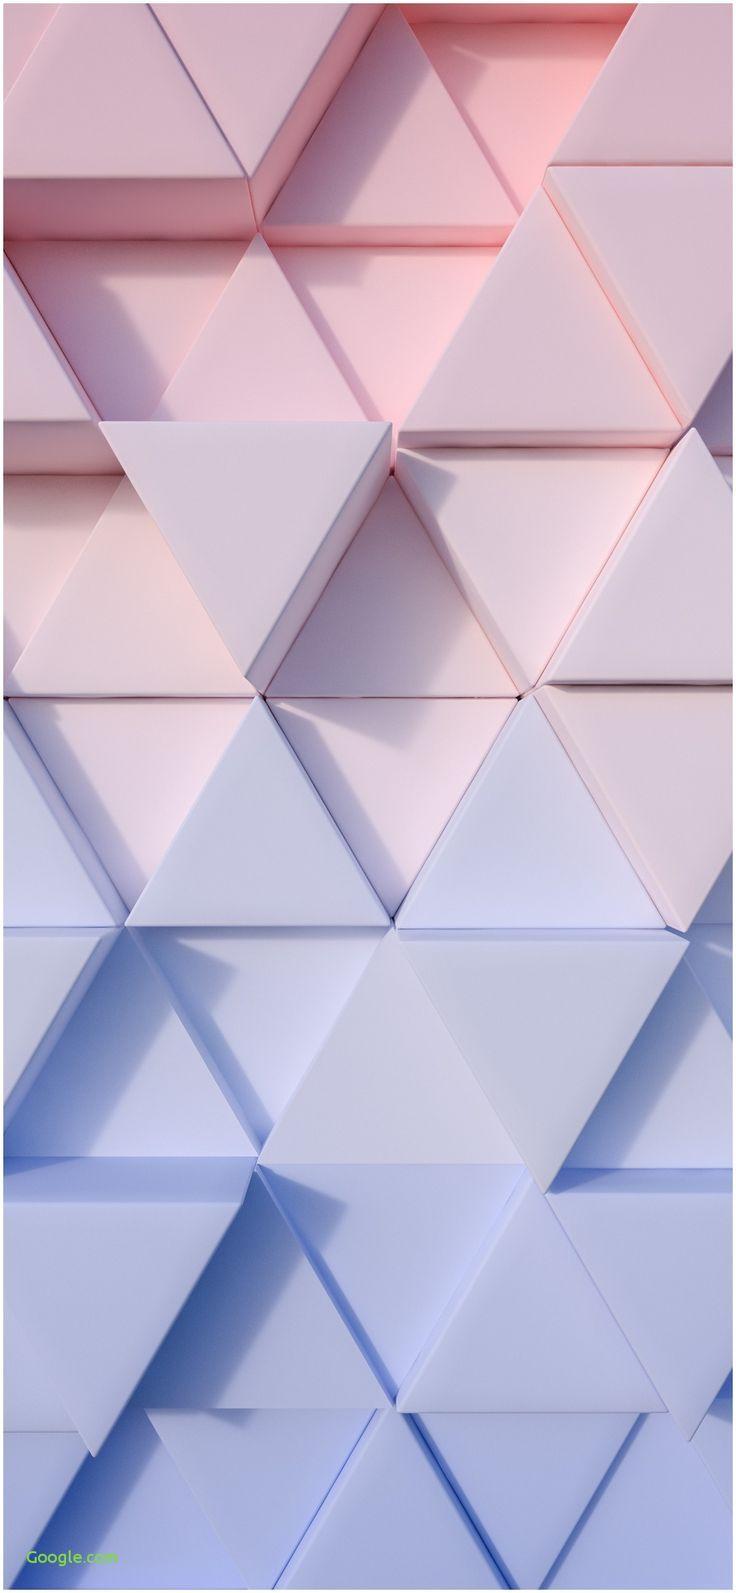 All Images Net Iphone Wallpaper 4k Einzigartige 1125 2436 Dreieck Pastell 3d 4k Ip Hubsche Tapeten Ipad Hintergrundbild Einhorn Tapete